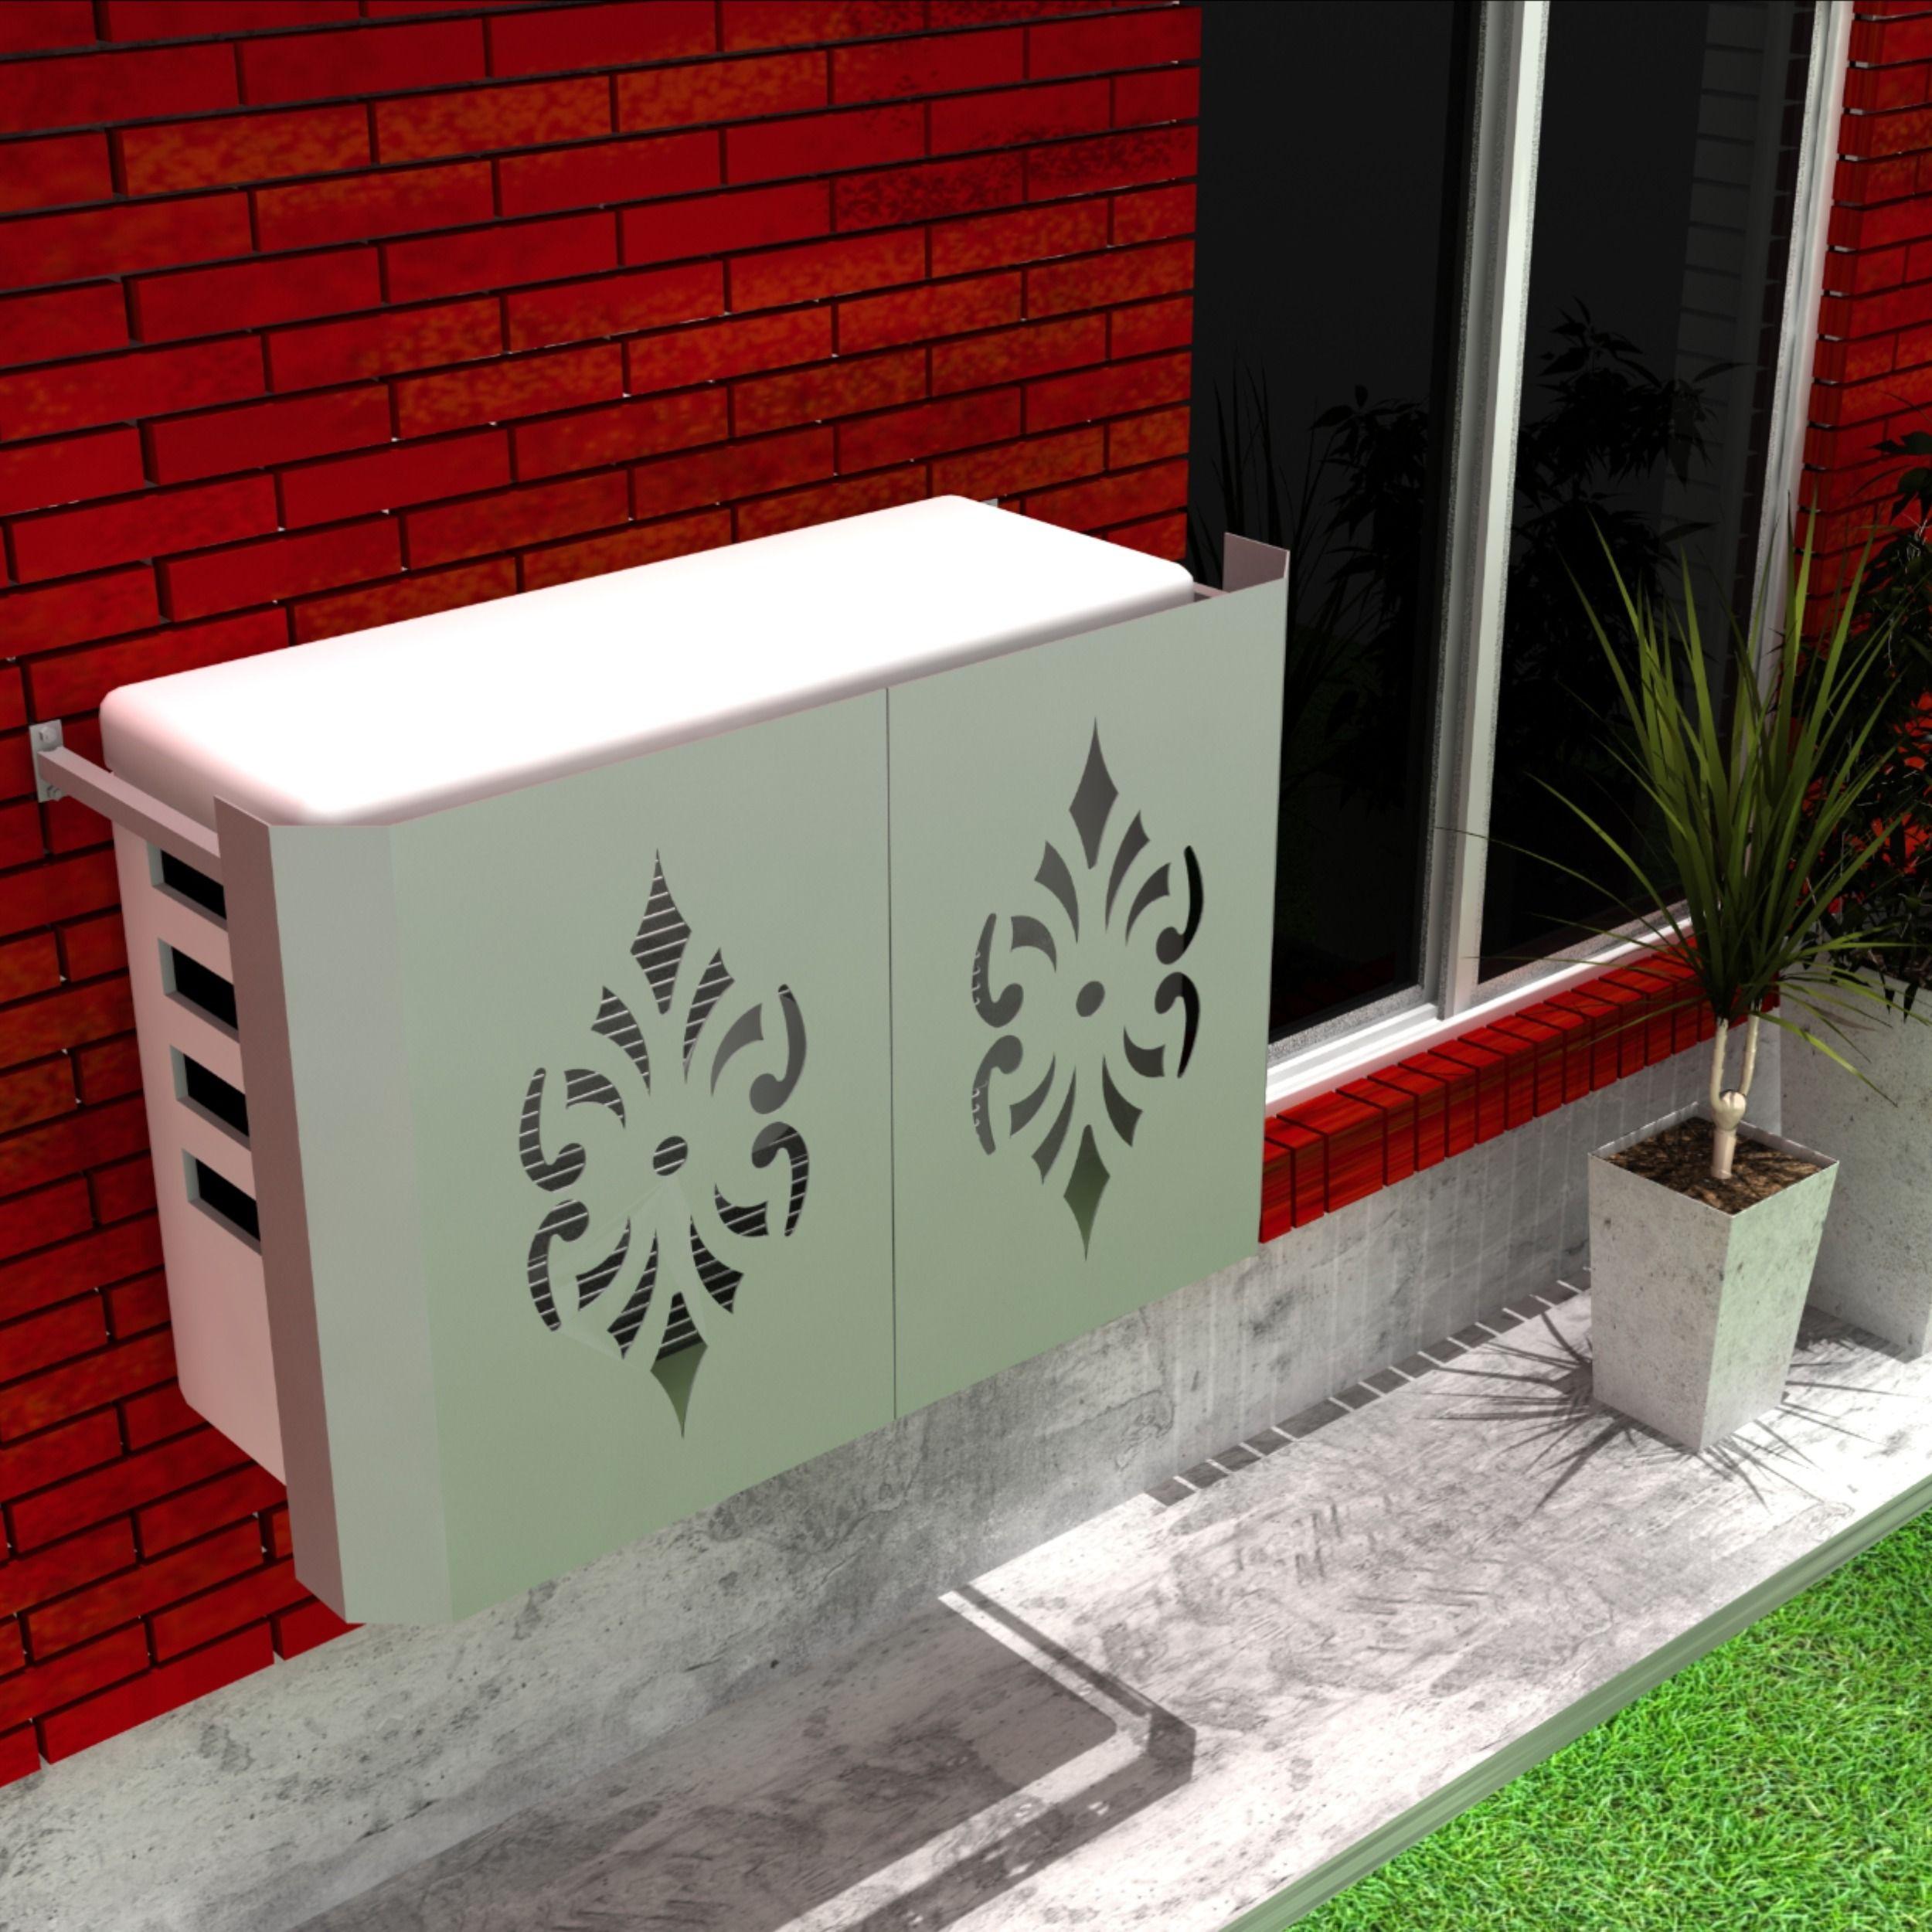 Cubridor de aire acondicionado exterior. Innova tu casa